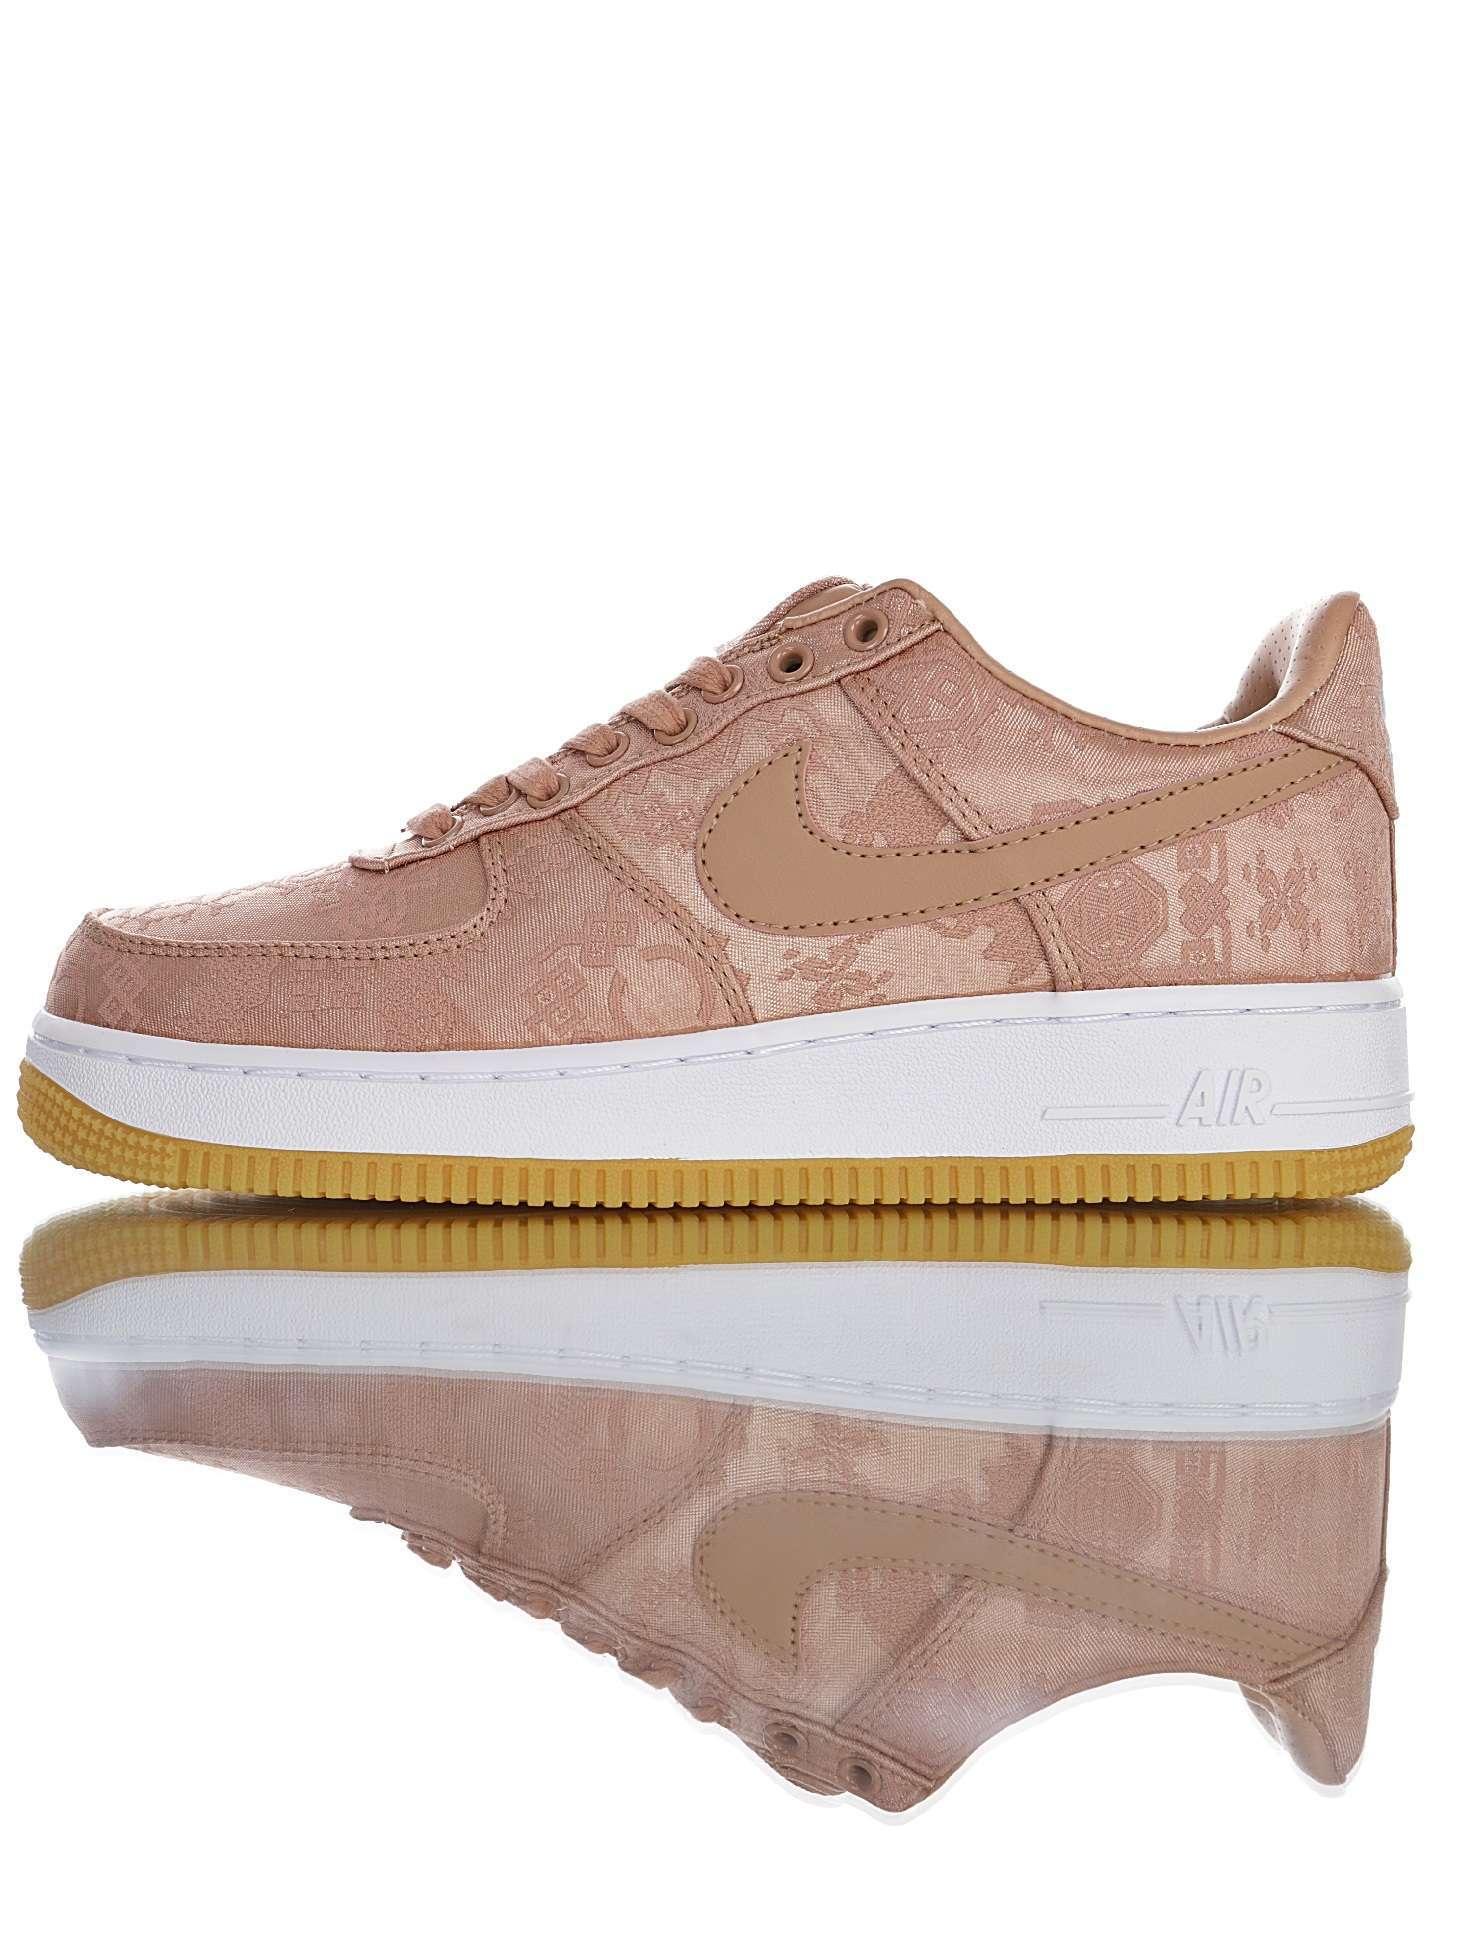 "CLOT x Nike Air Force 1 Low ""Rose Gold"""